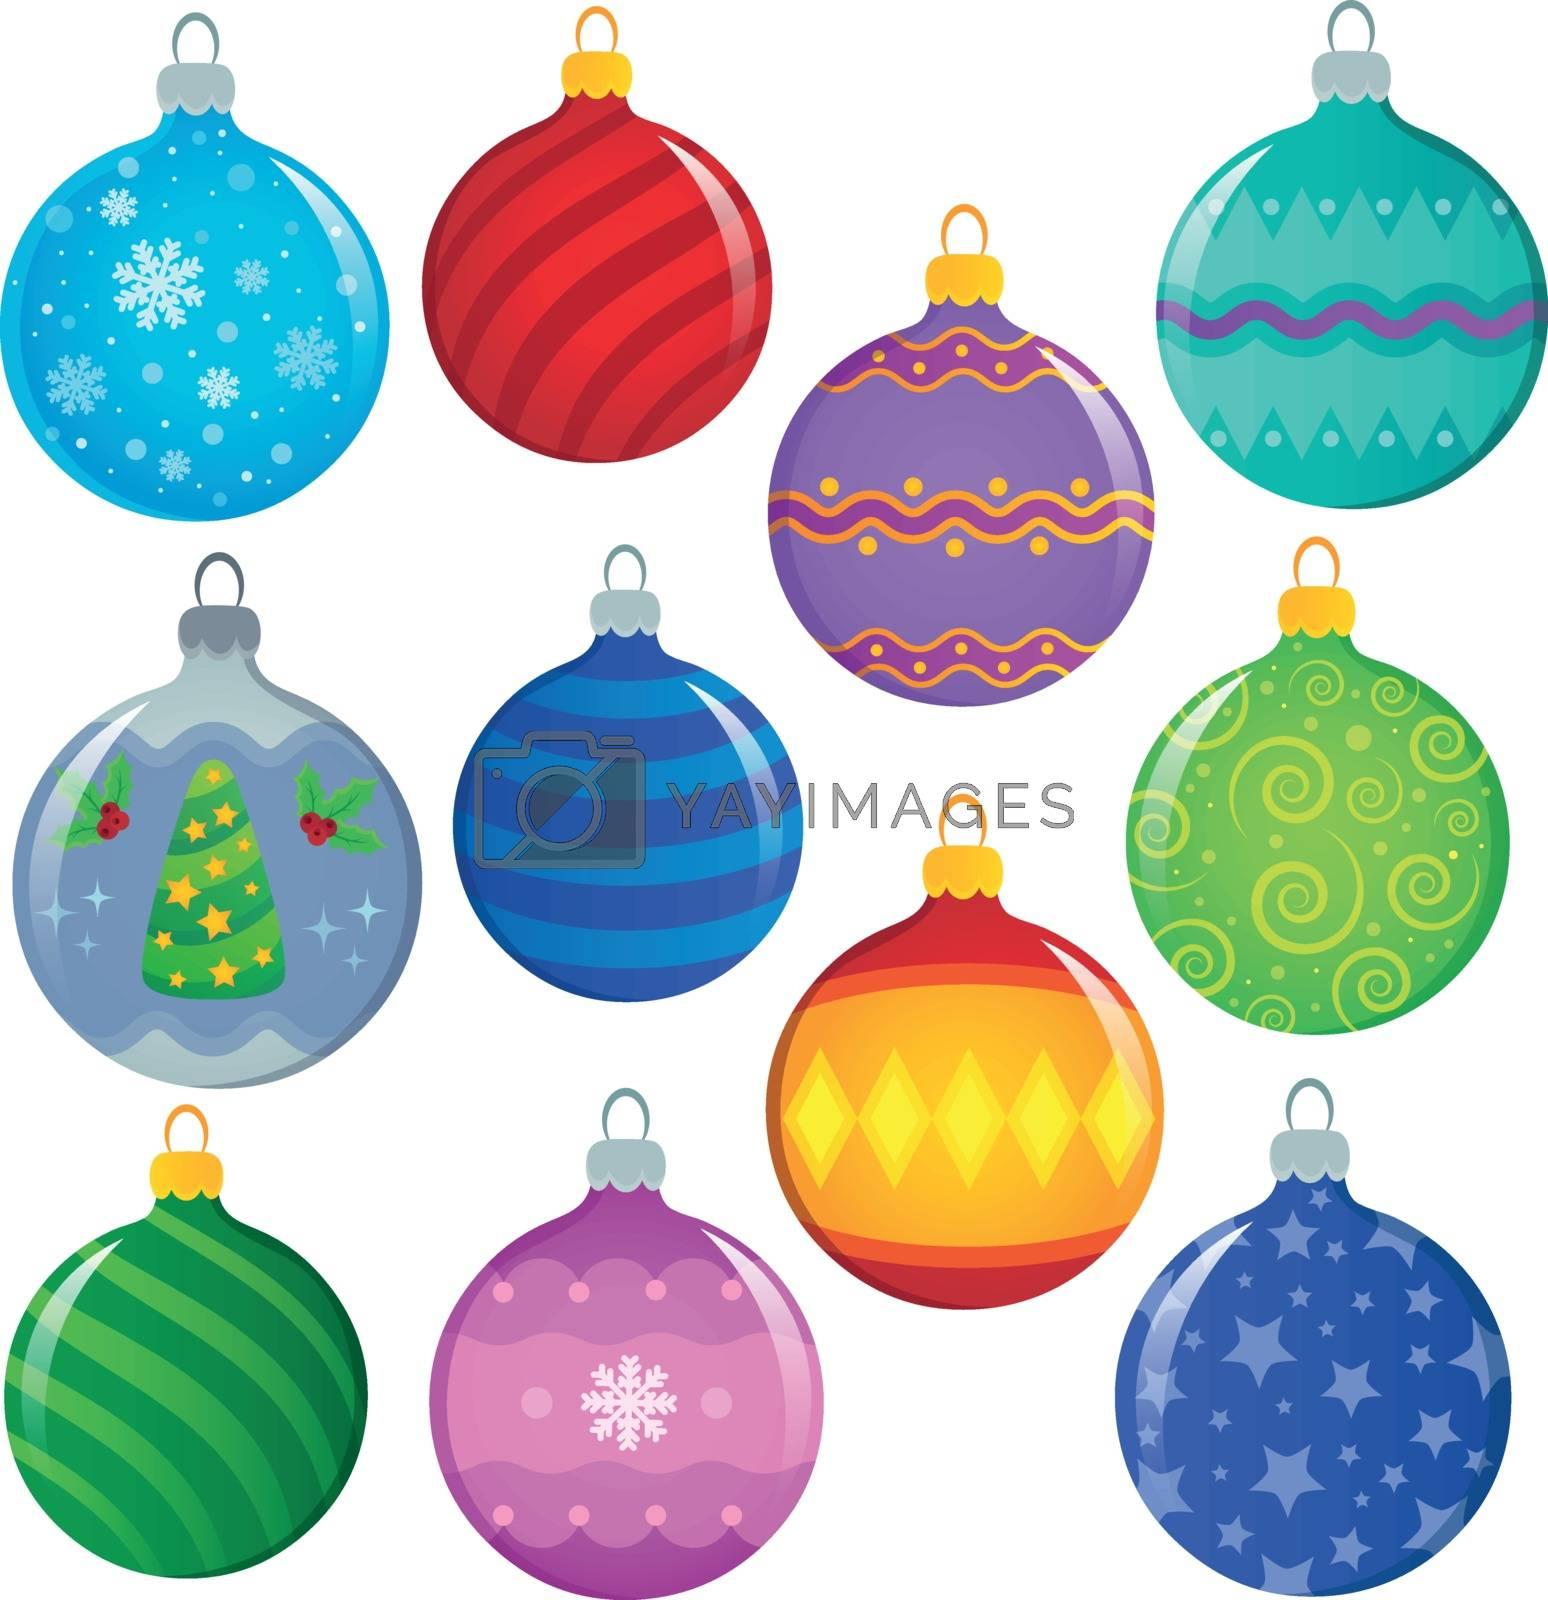 Stylized Christmas ornaments theme set 1 - eps10 vector illustration.